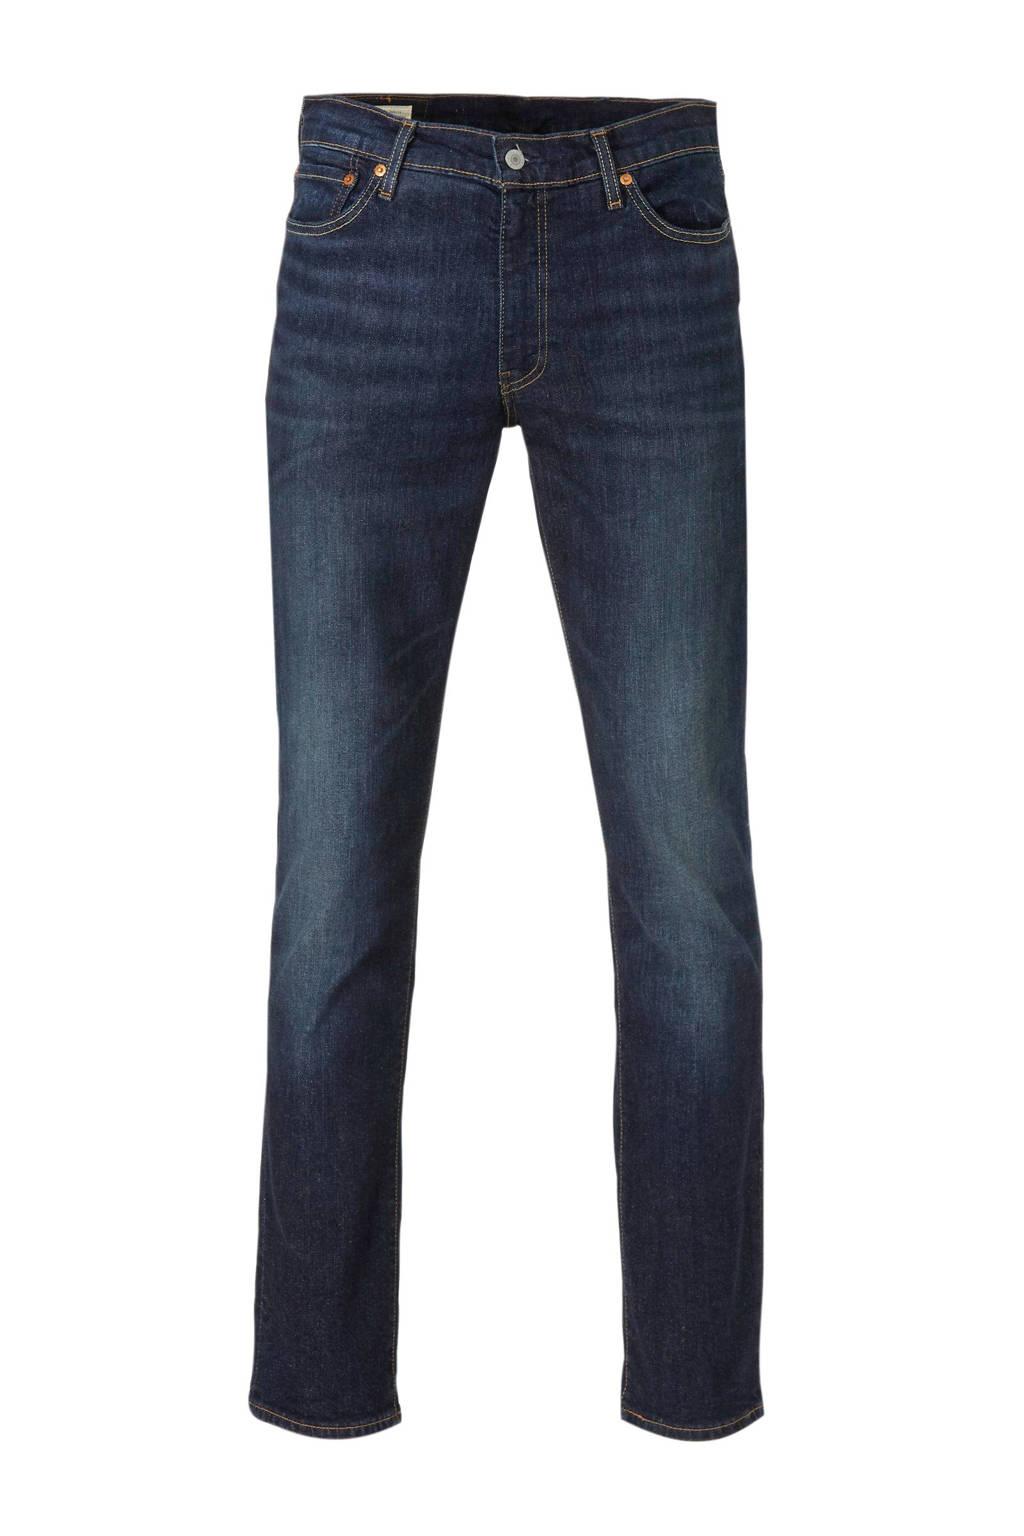 Levi's slim fit jeans 511 biologica, Biologica Adv